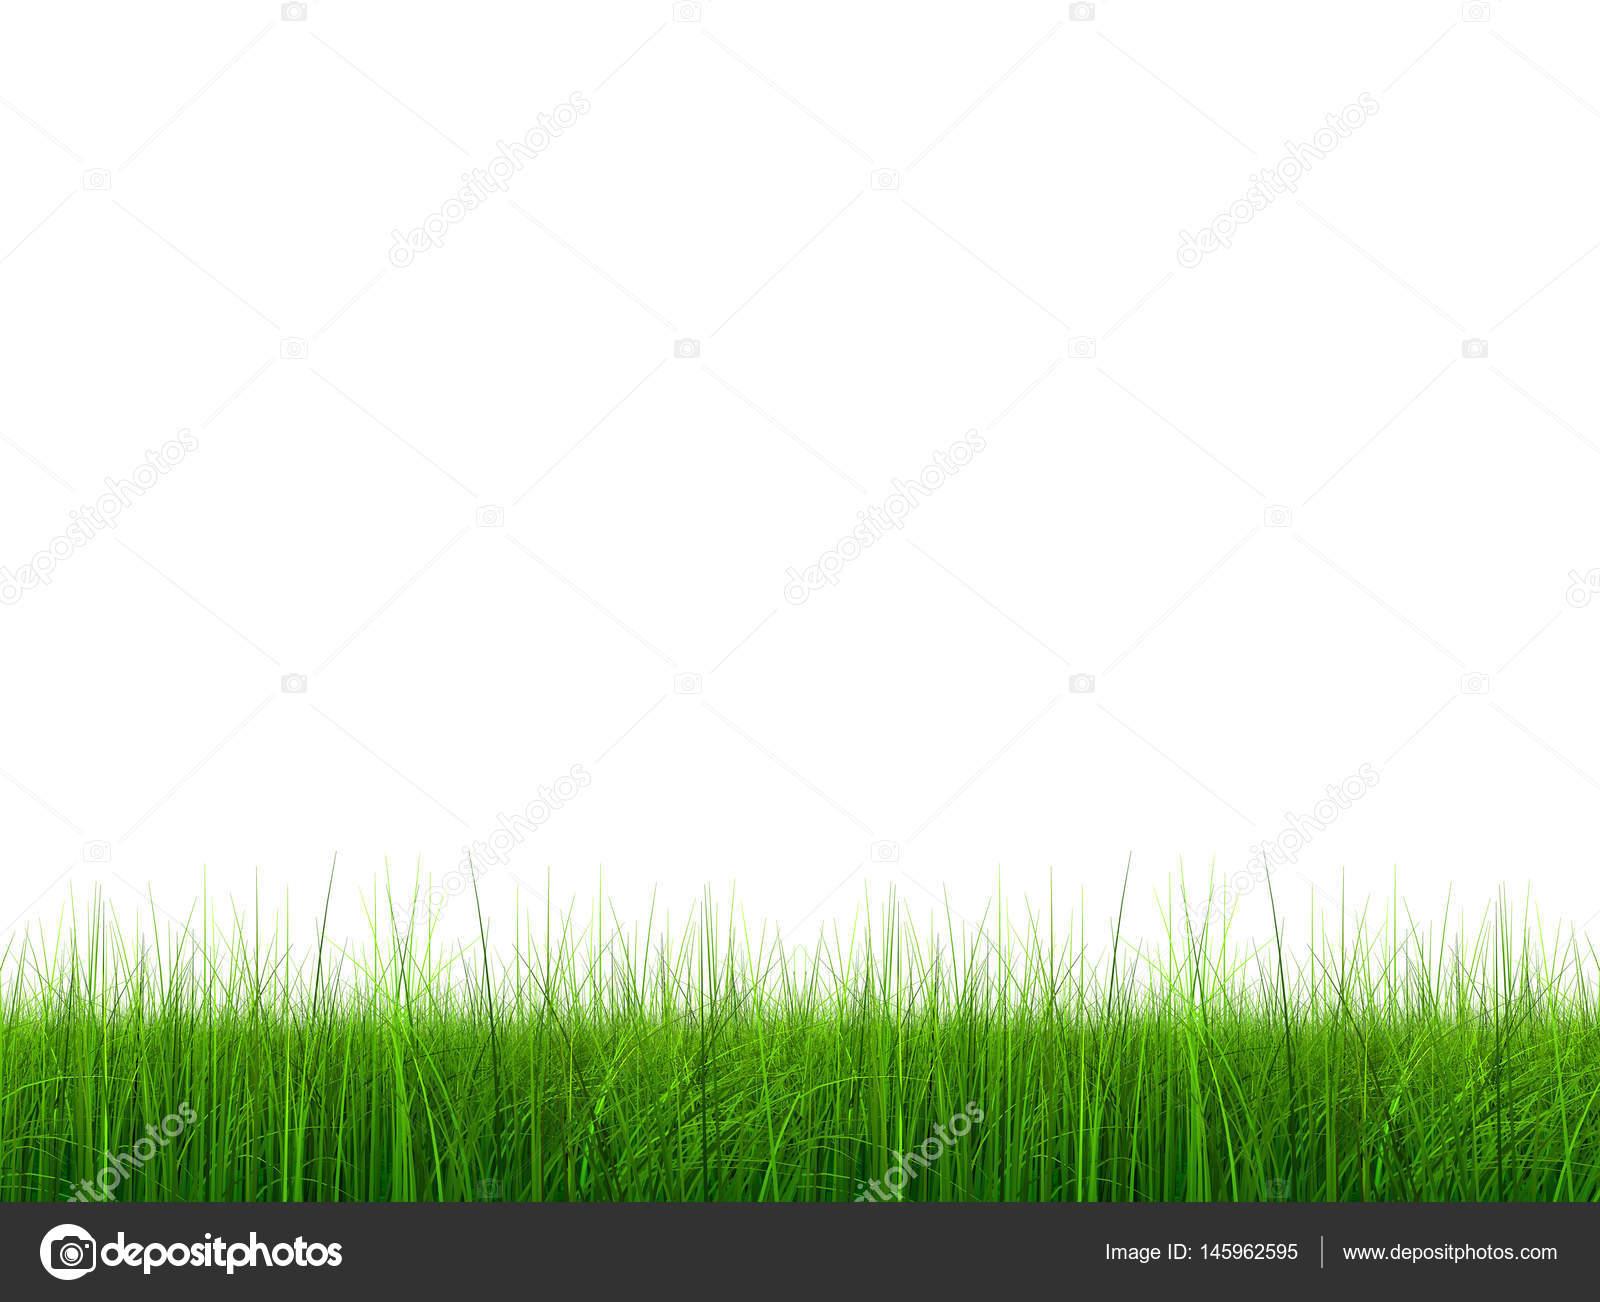 High Resolution Green Fresh And Natural 3d Grass Field Stock Photo C Design36 145962595